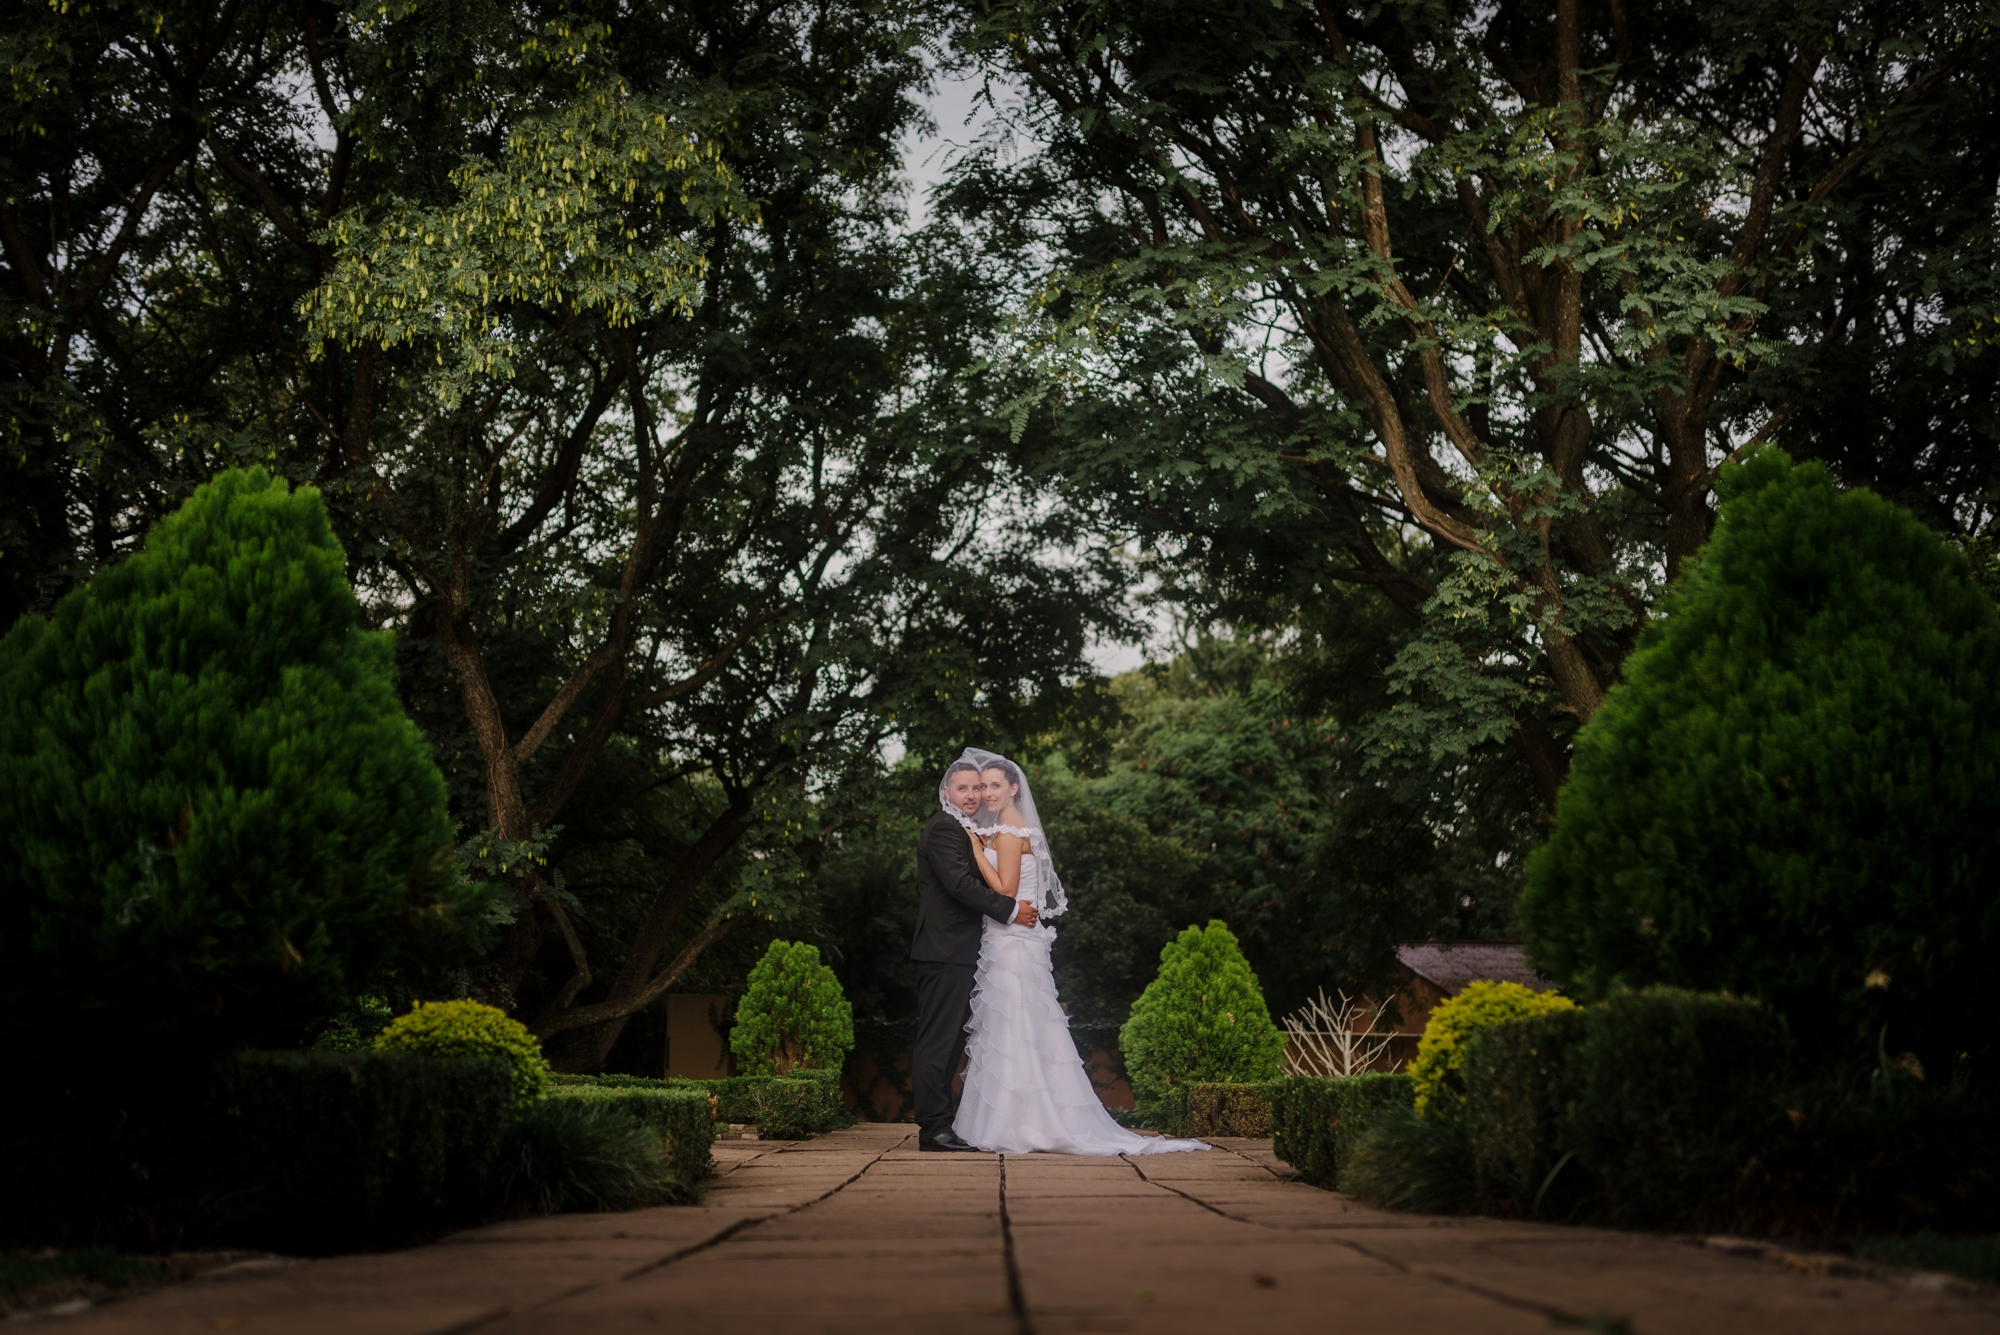 wedding photography, The Moon and Sixpense, wedding photos, beautiful bride, exquisite wedding